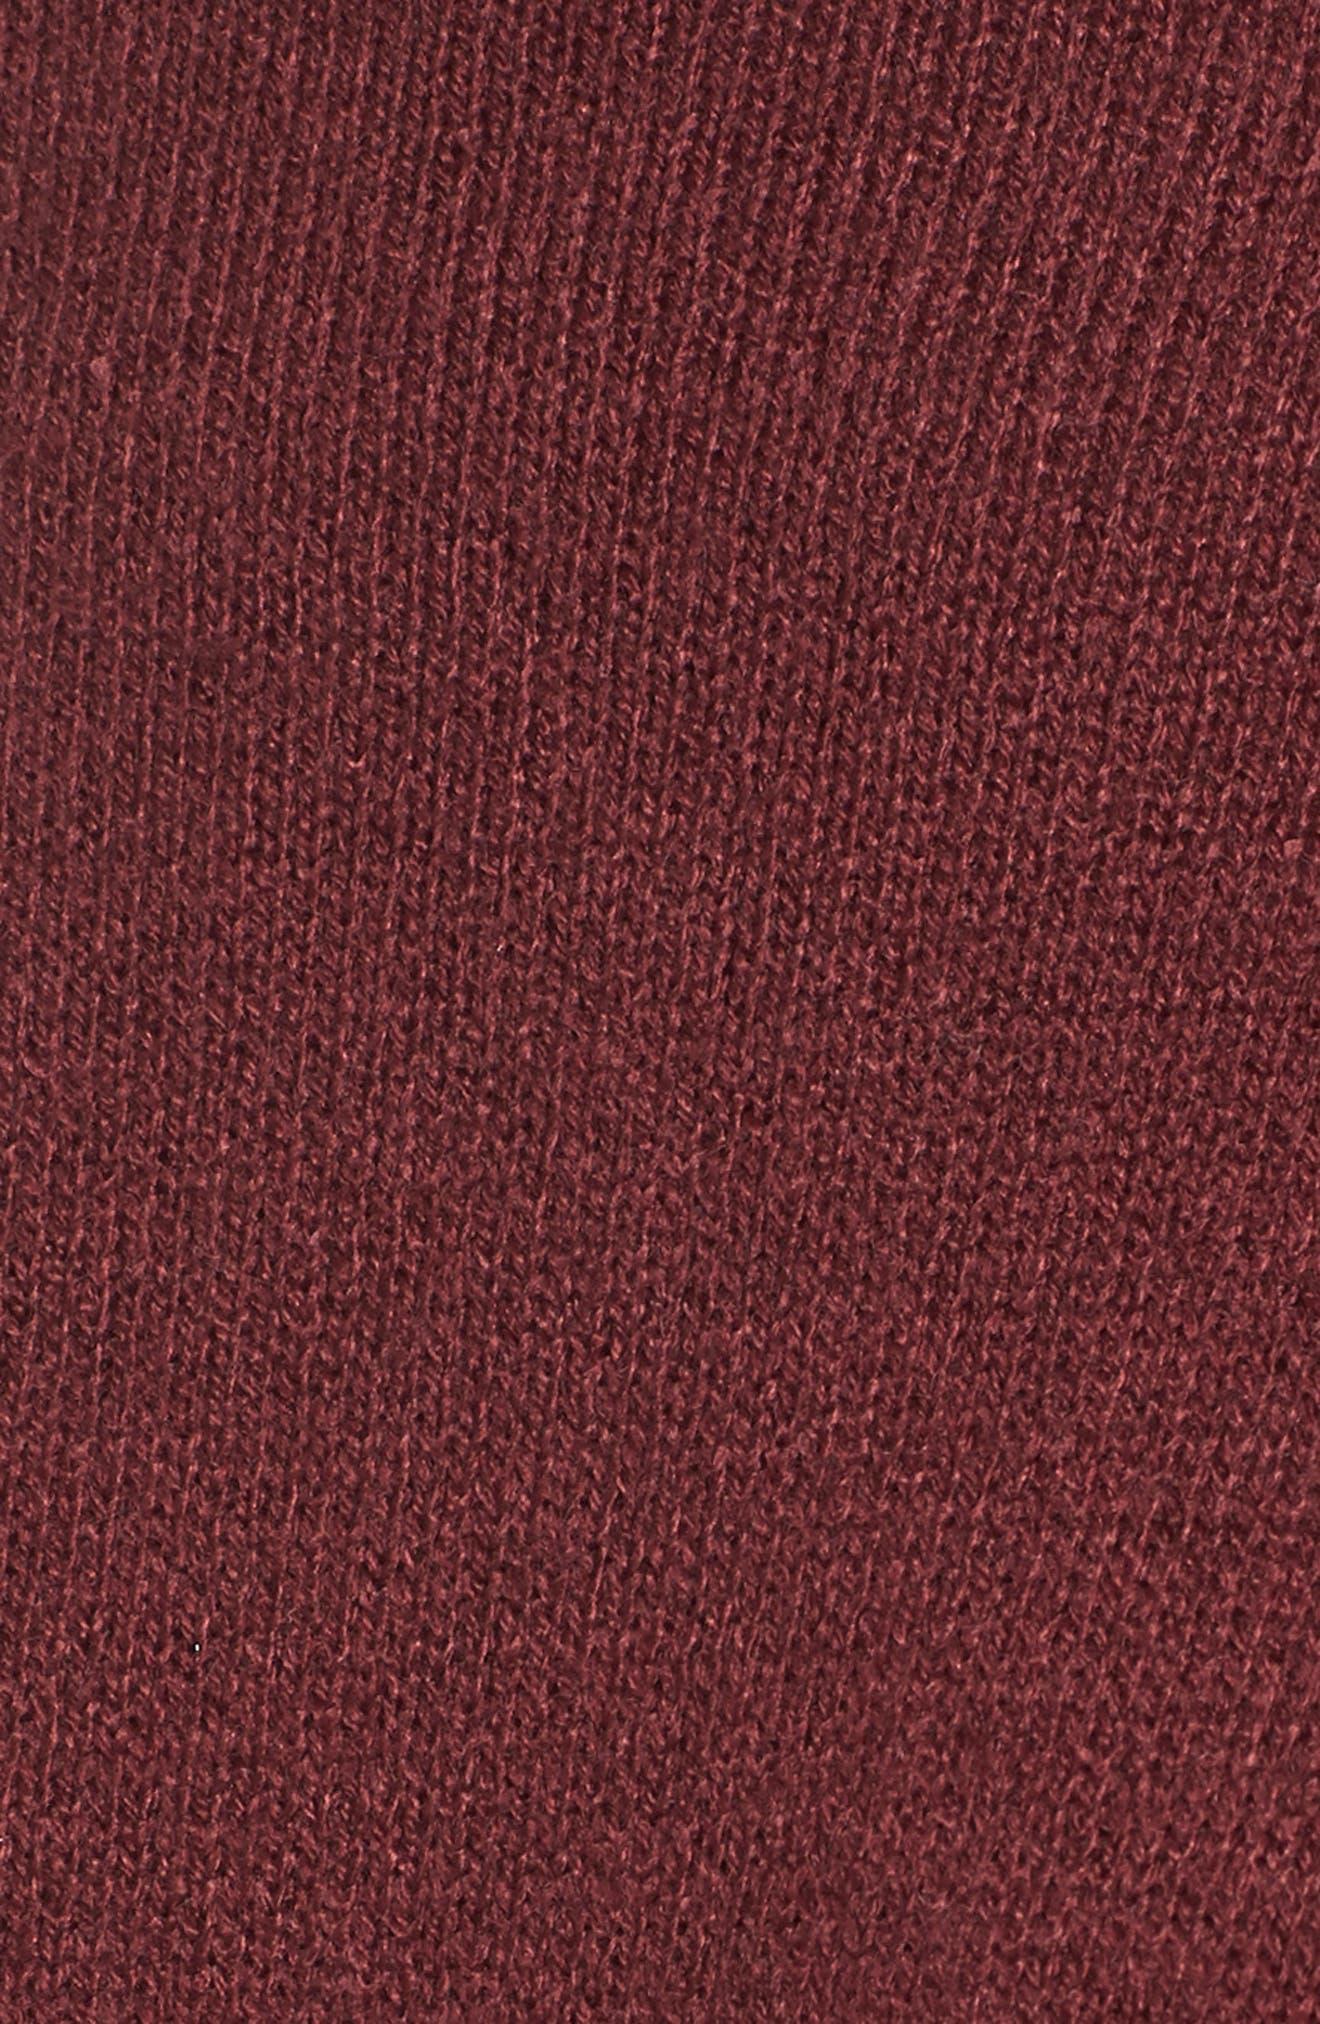 Ruffle Knit Sweater Dress,                             Alternate thumbnail 5, color,                             Burgundy Royale